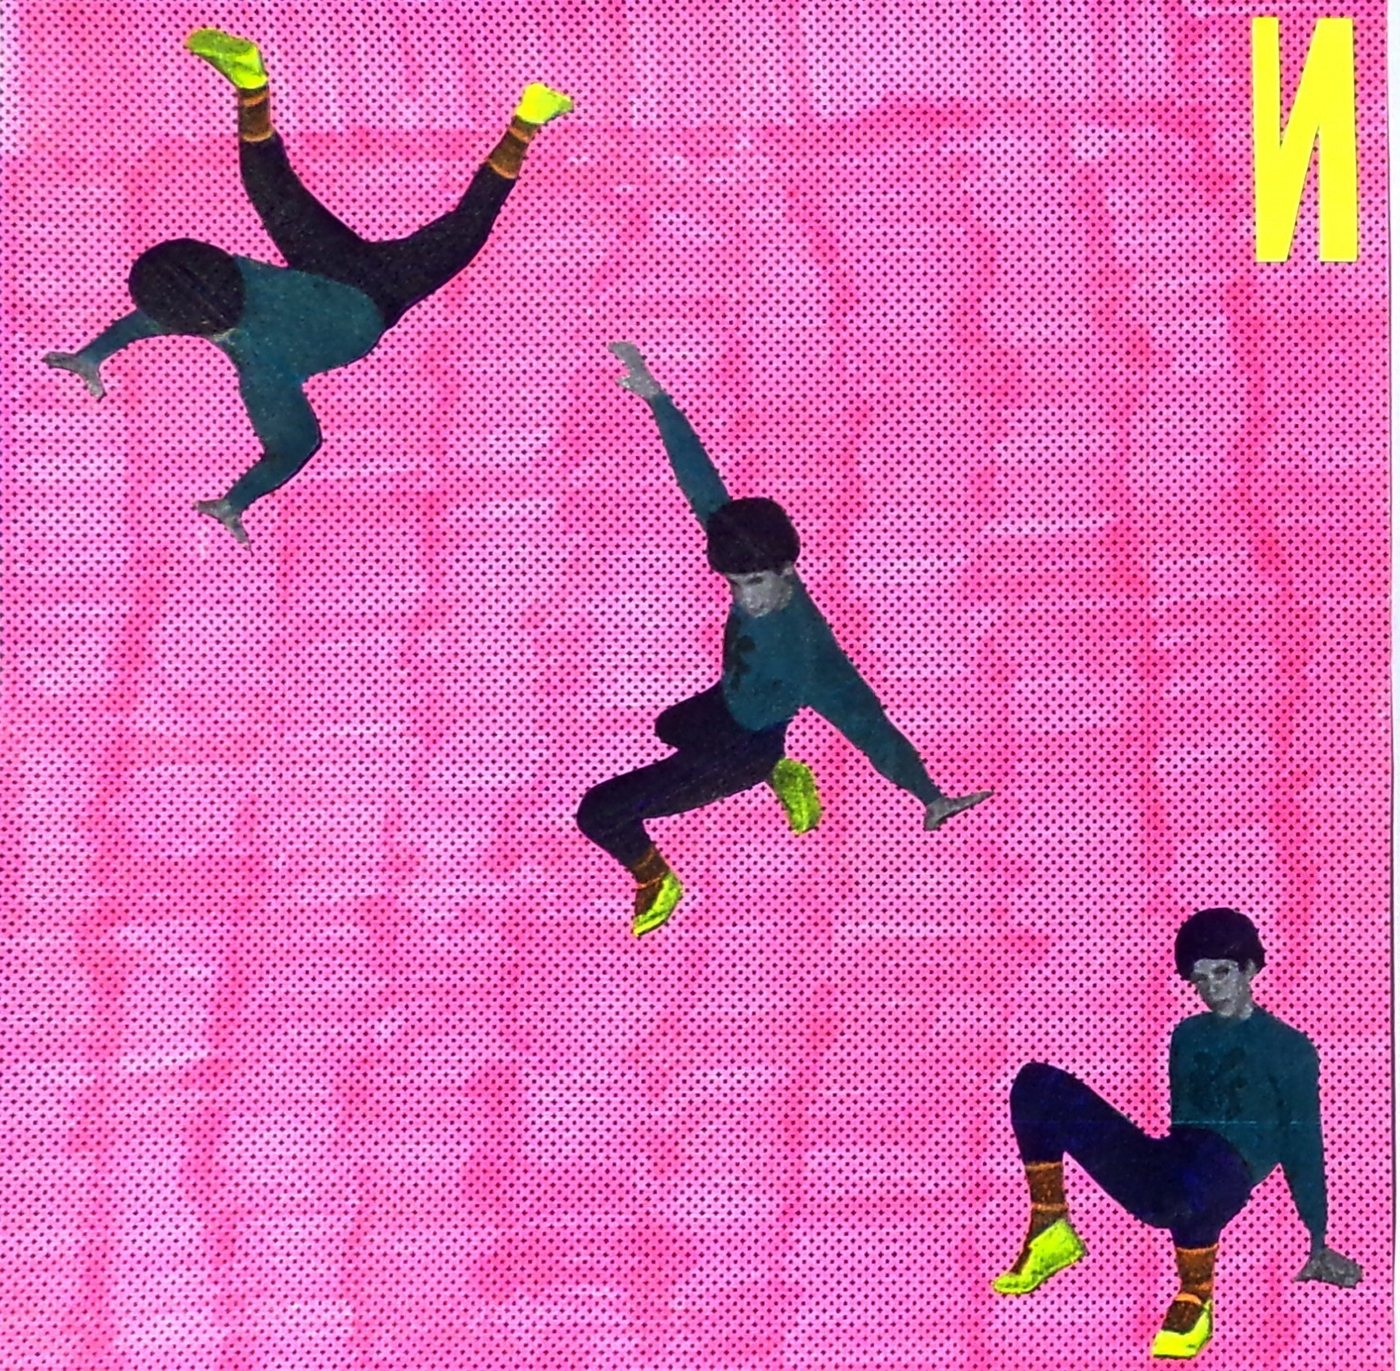 rap 90s cd Gabriele vinyl edicion de lujo fadu cover color